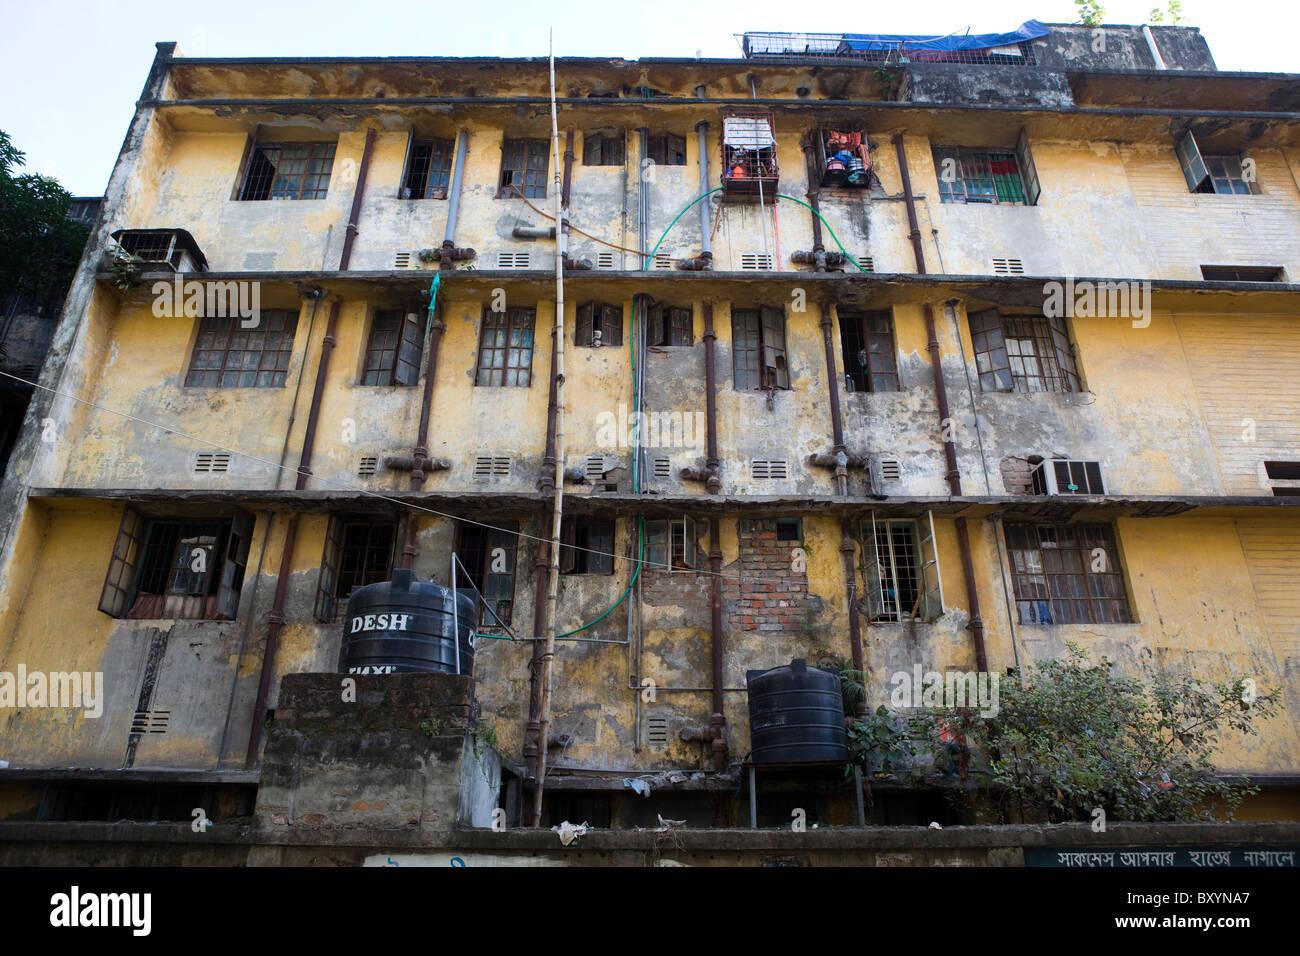 Run-down building, Dhaka, Bangladesh - Stock Image